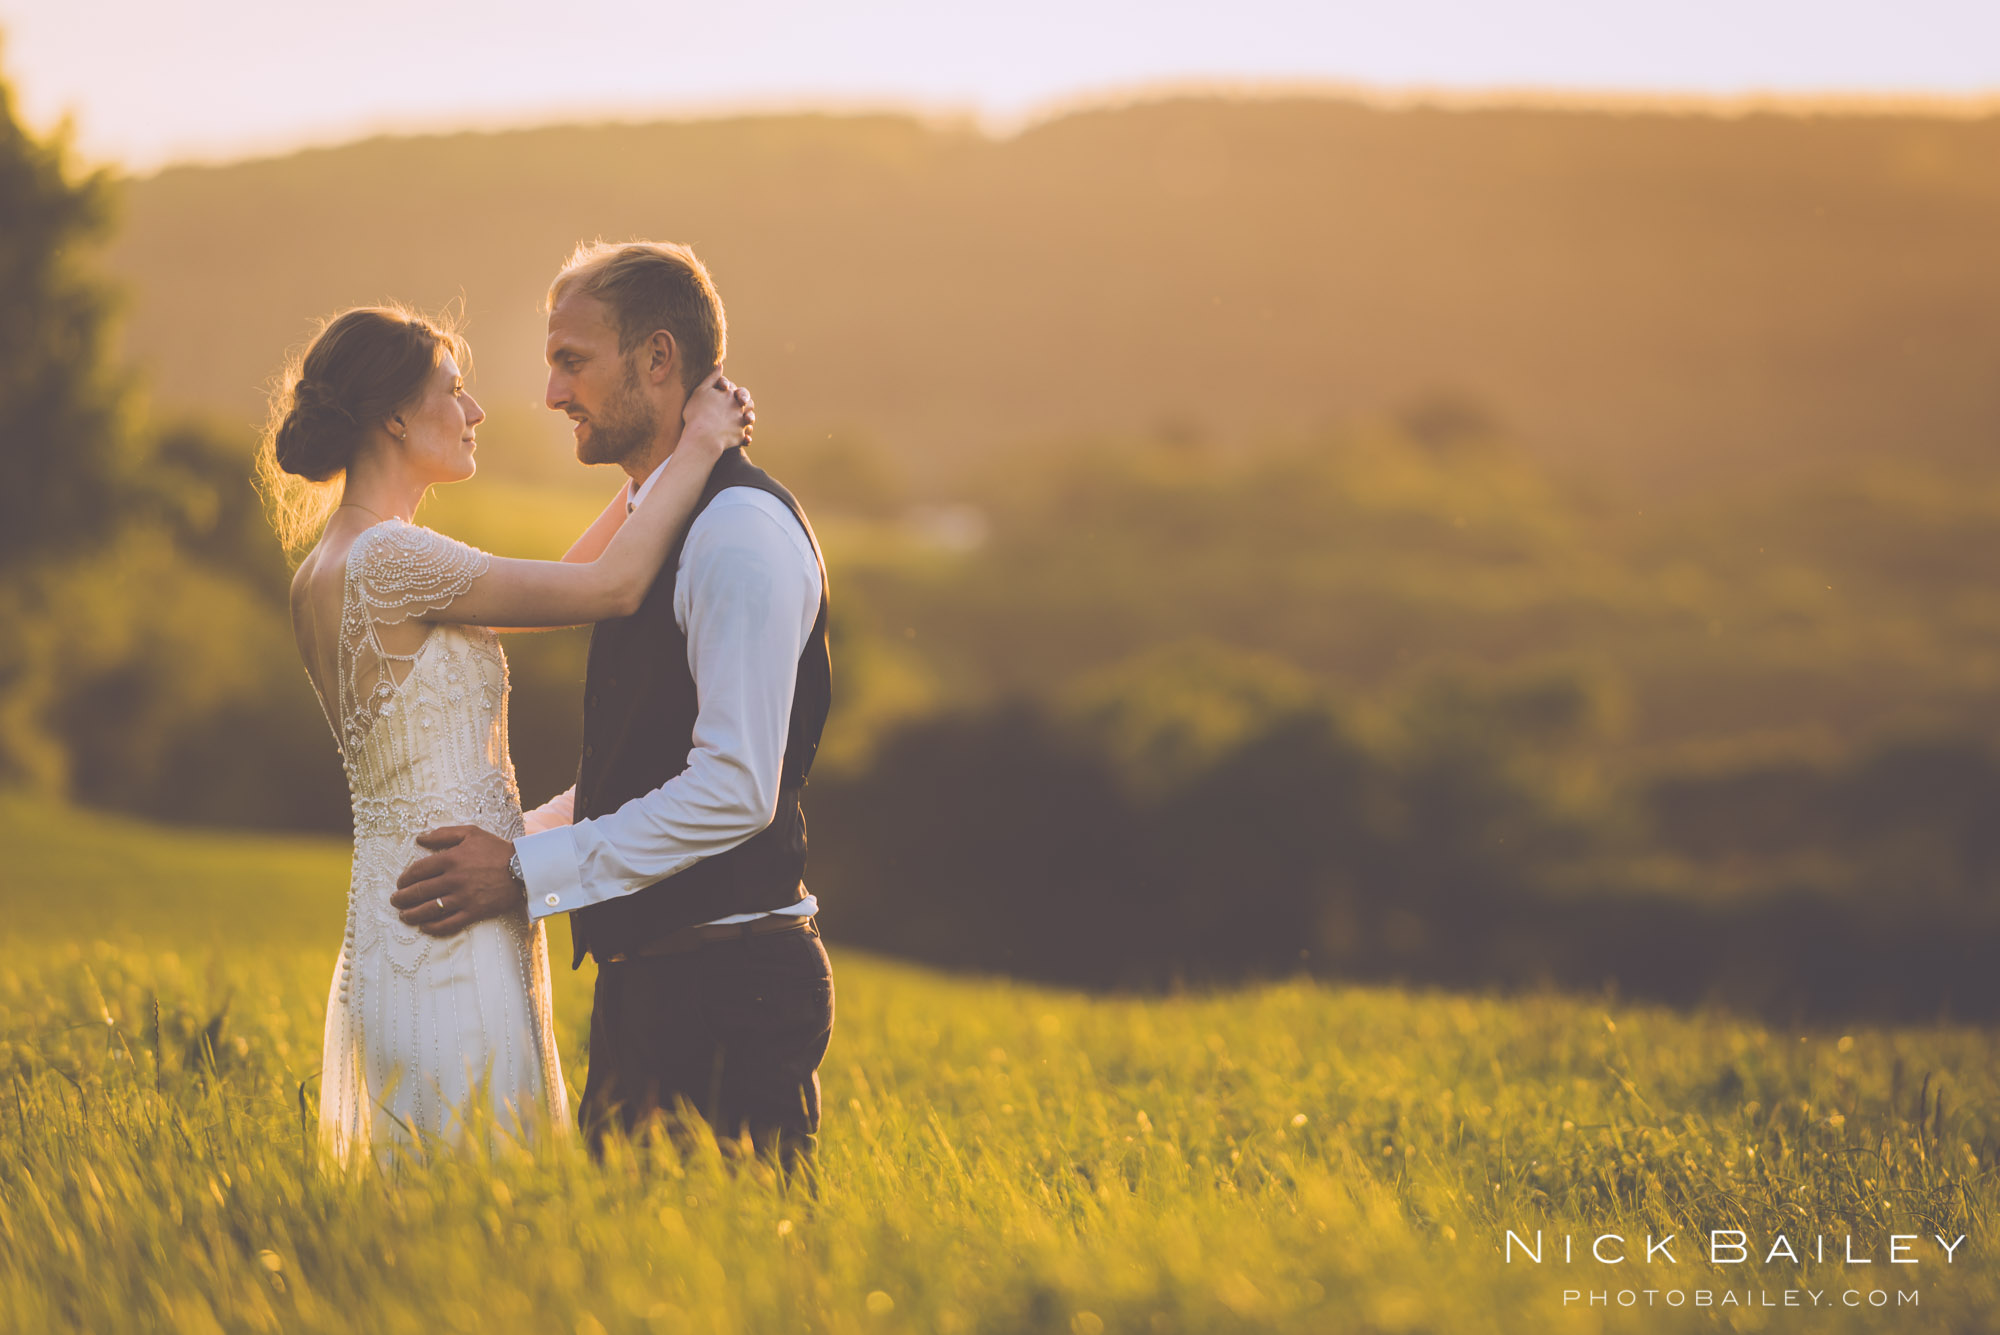 wedding-photographer-bodmin-99.jpg